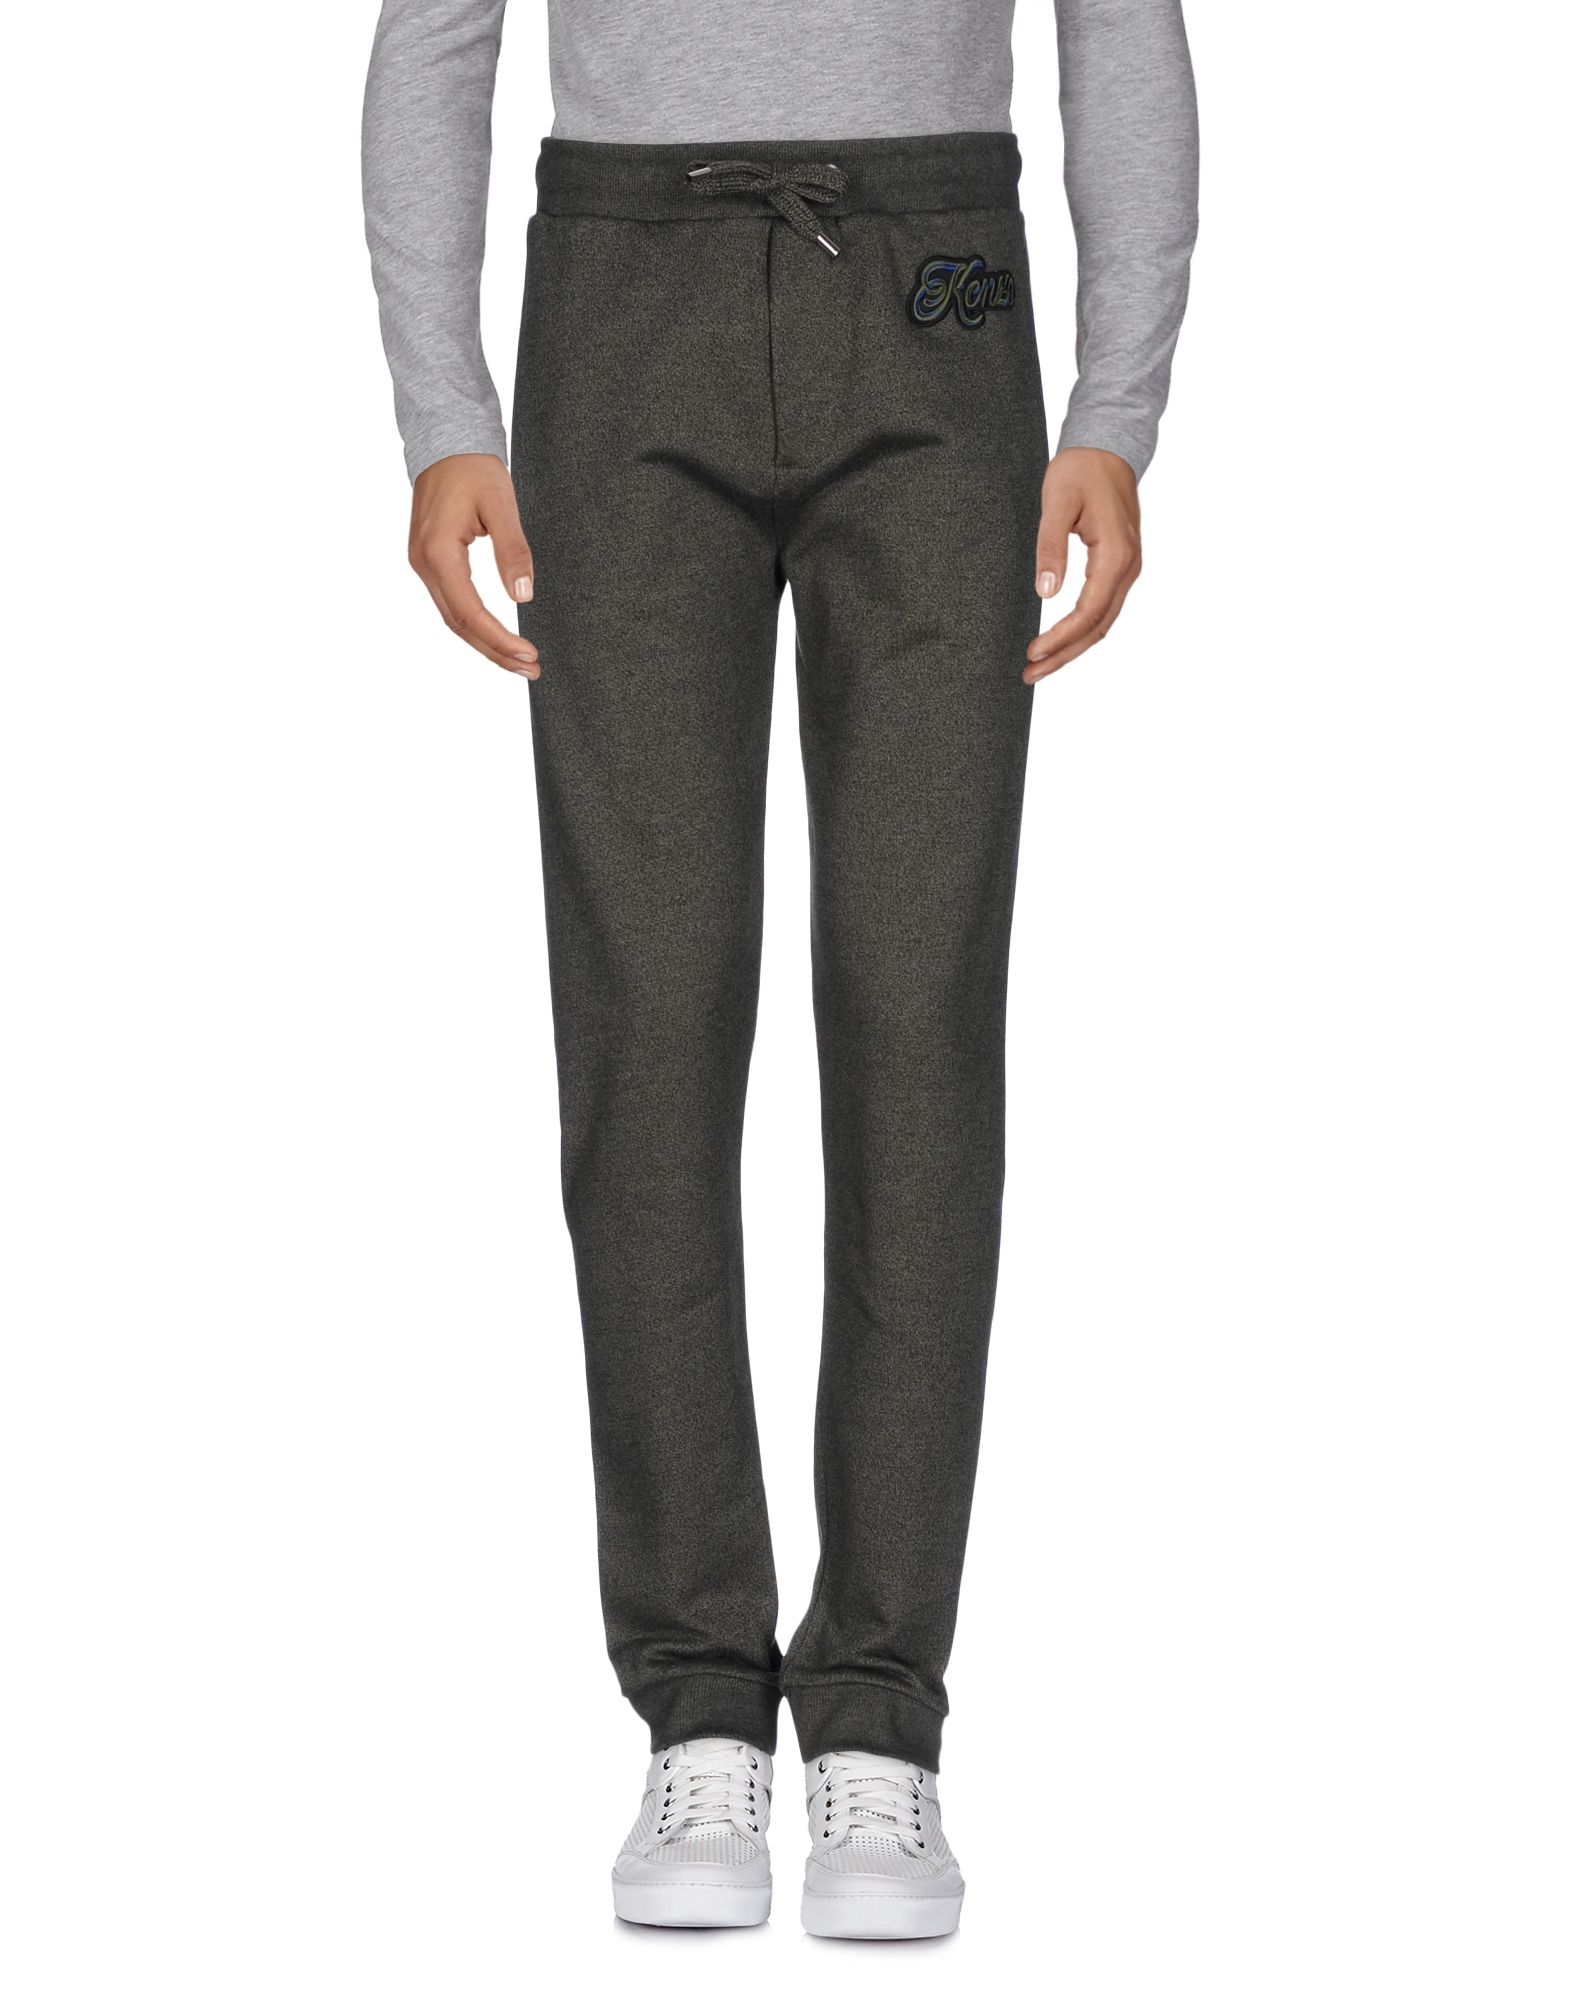 Pantalone Kenzo Uomo - Acquista online su